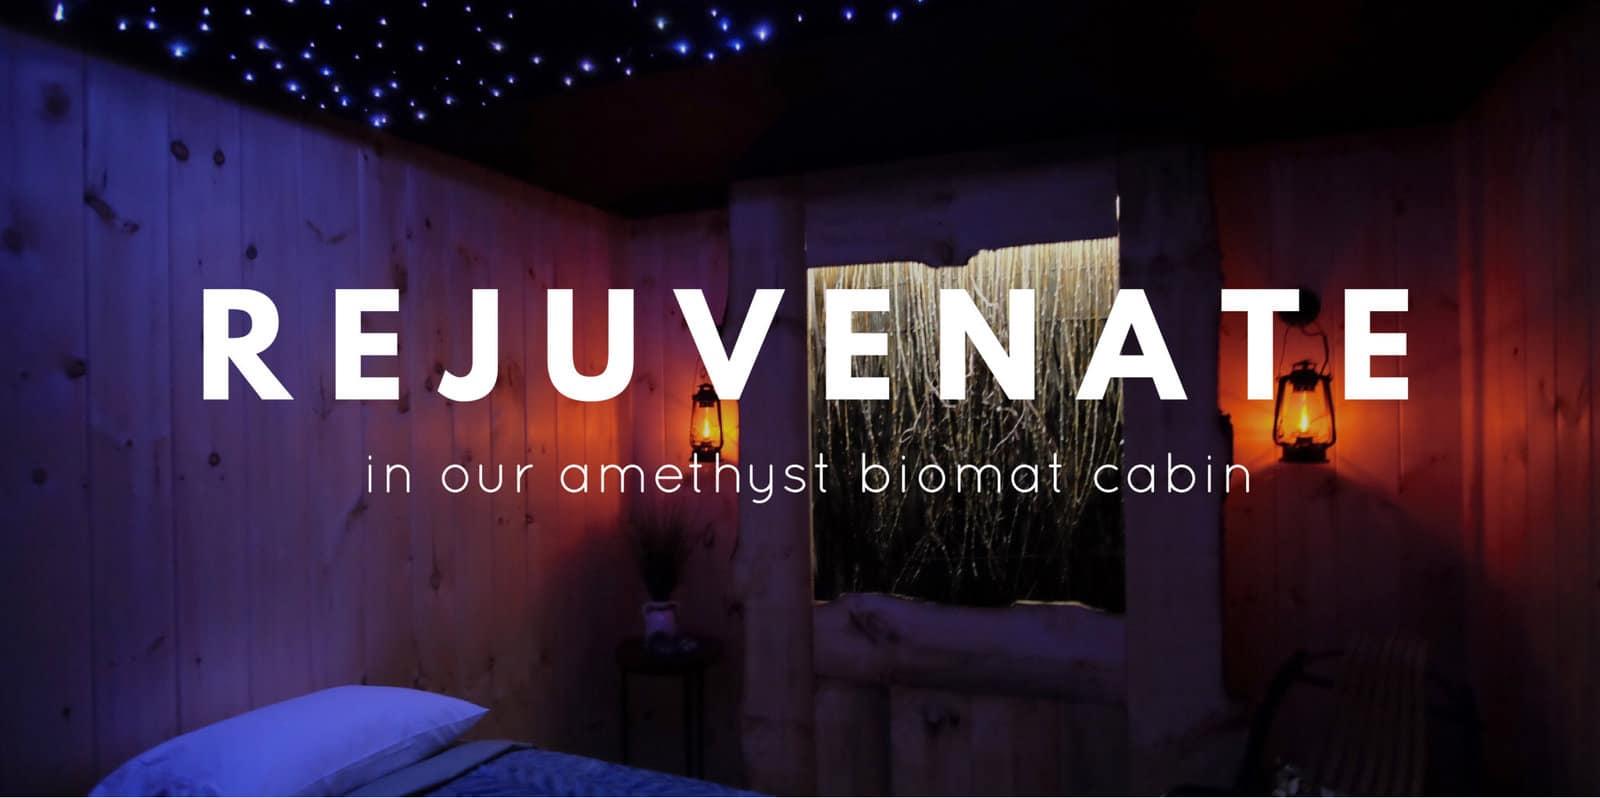 a rejuvenating amethyst biomat cabin